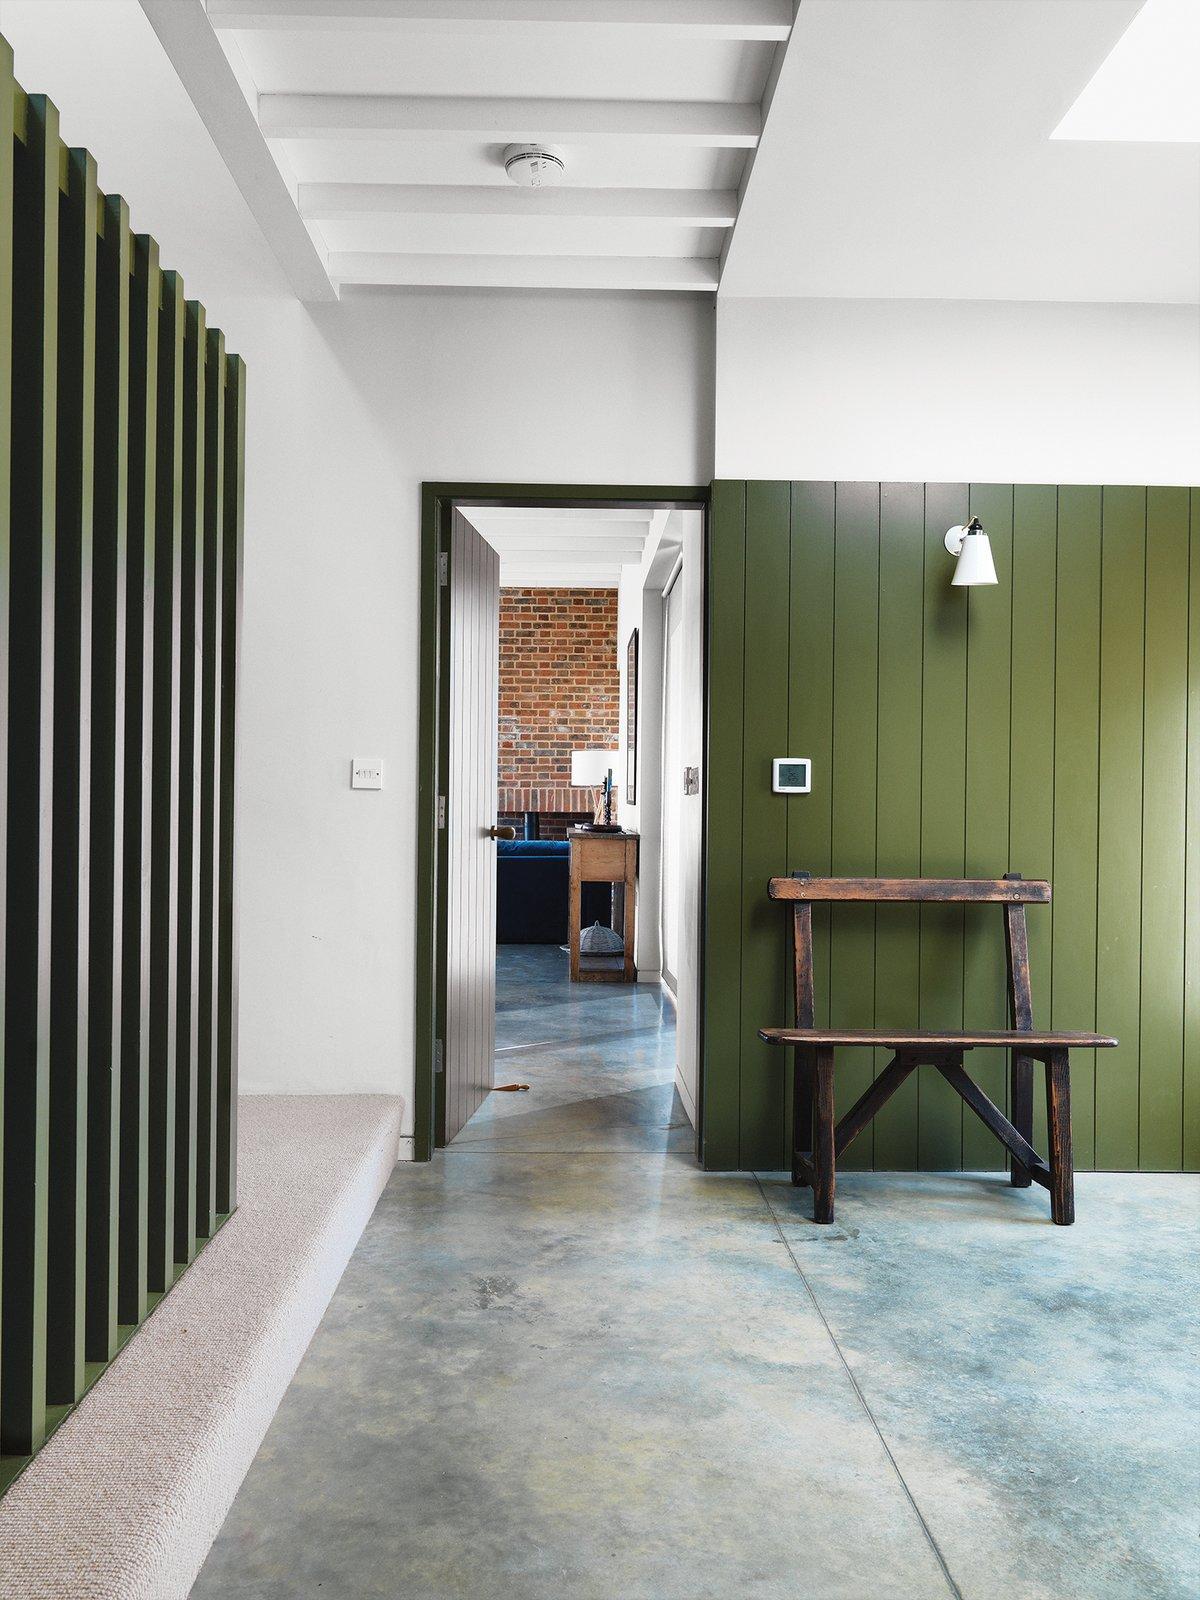 #color #huntergreen #wood #panel #farmhouse #interior #minimal #bench #antique #Suffolk #England #LucyMarston